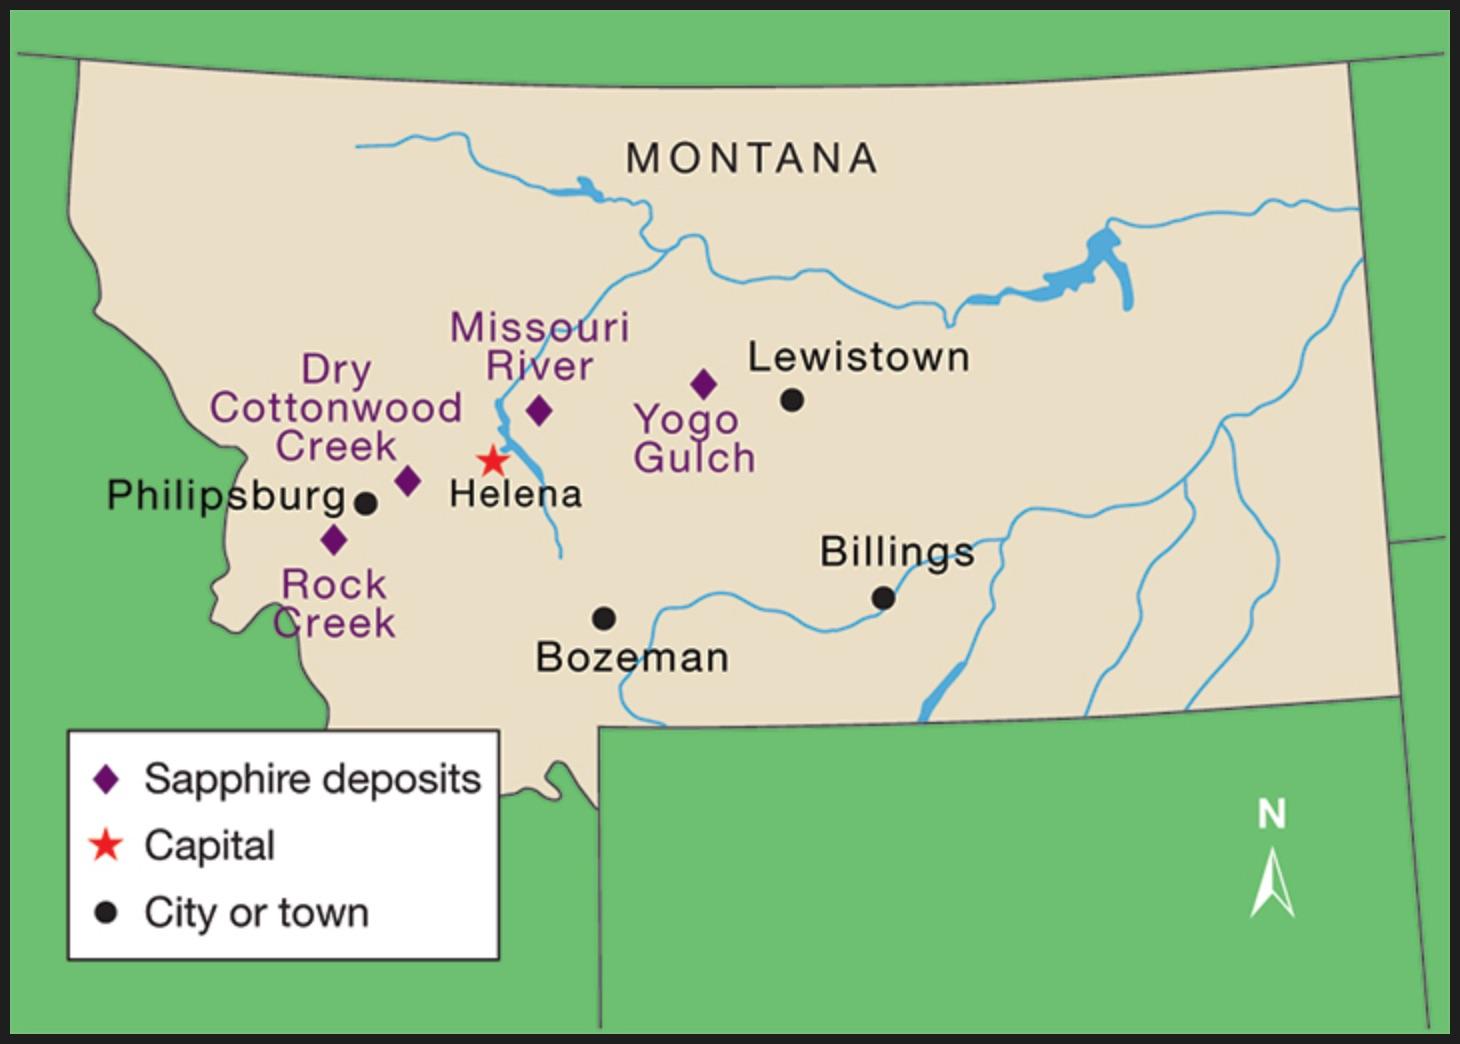 Map of Montana mining operations